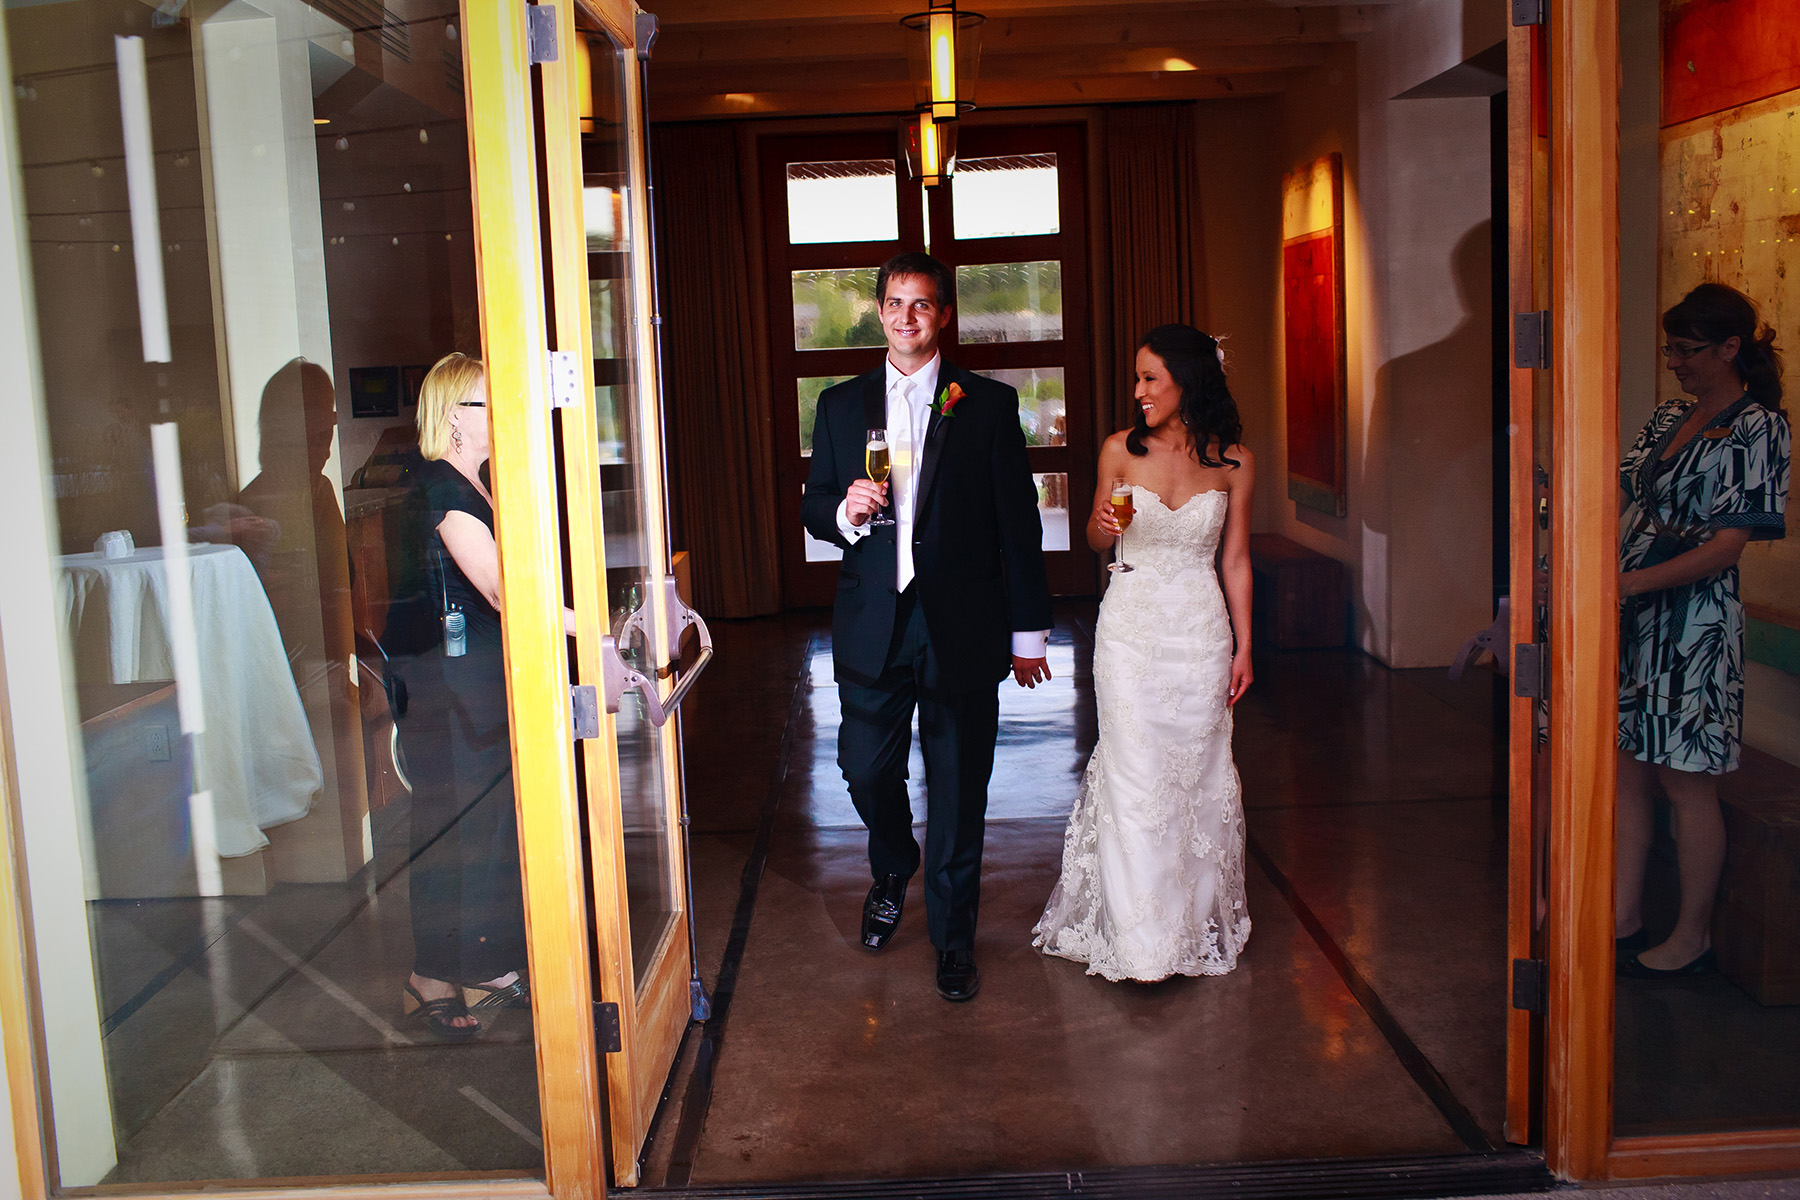 Tabitha-Dallas-wedding-four-seasons-resort-rancho-encantado-santa-fe-new-mexico-1063